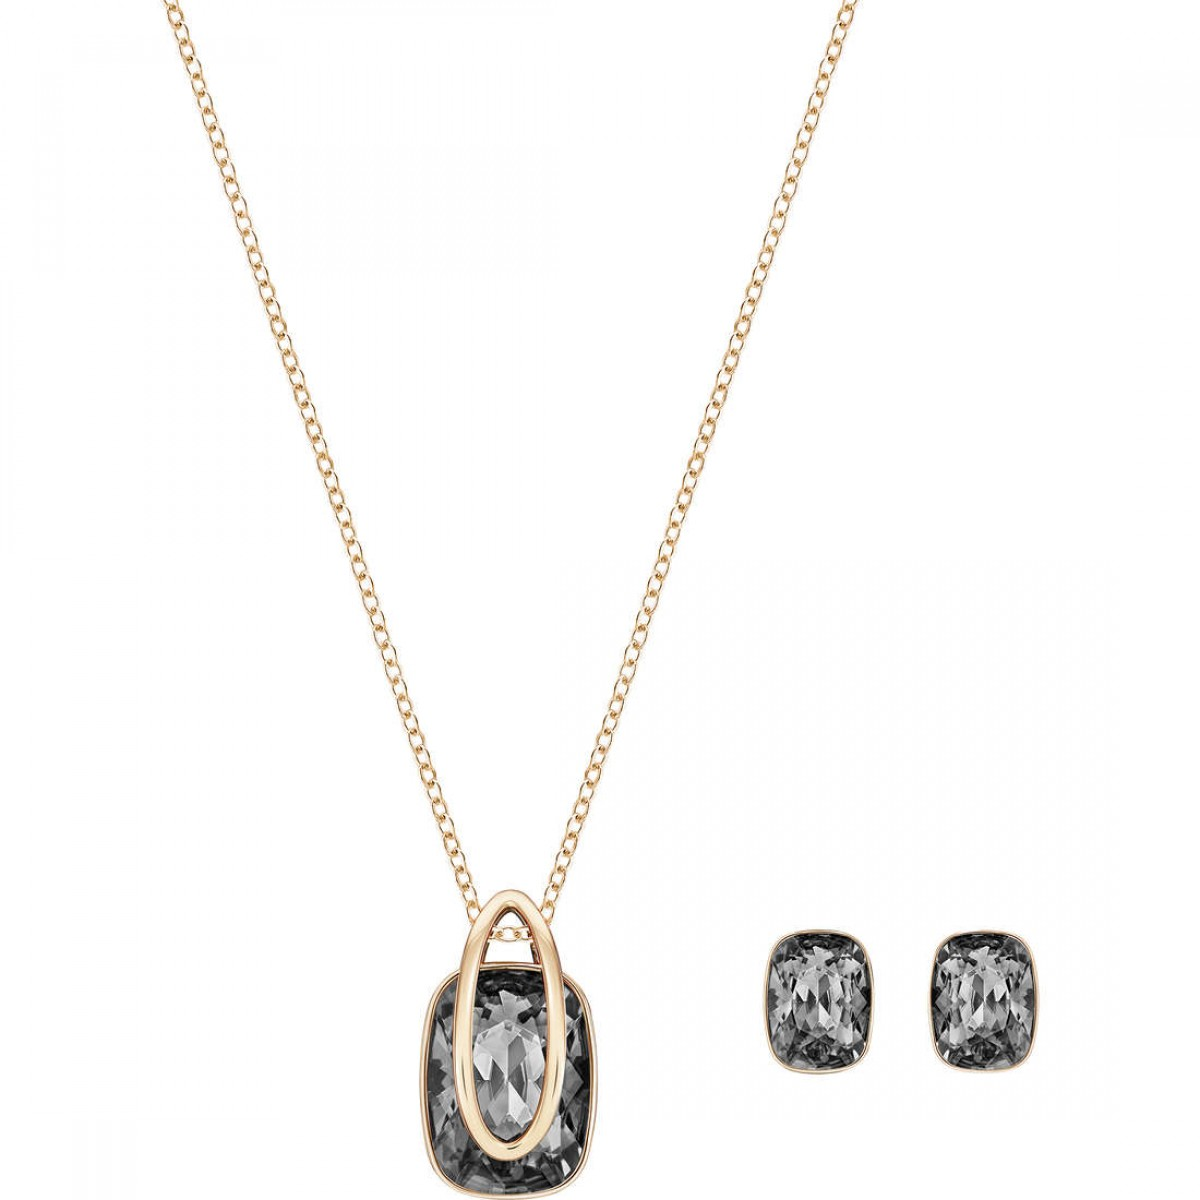 Necklace - Earrings Holding Set 5345166 ΓΥΝΑΙΚΕΙΑ ac22b3ab7